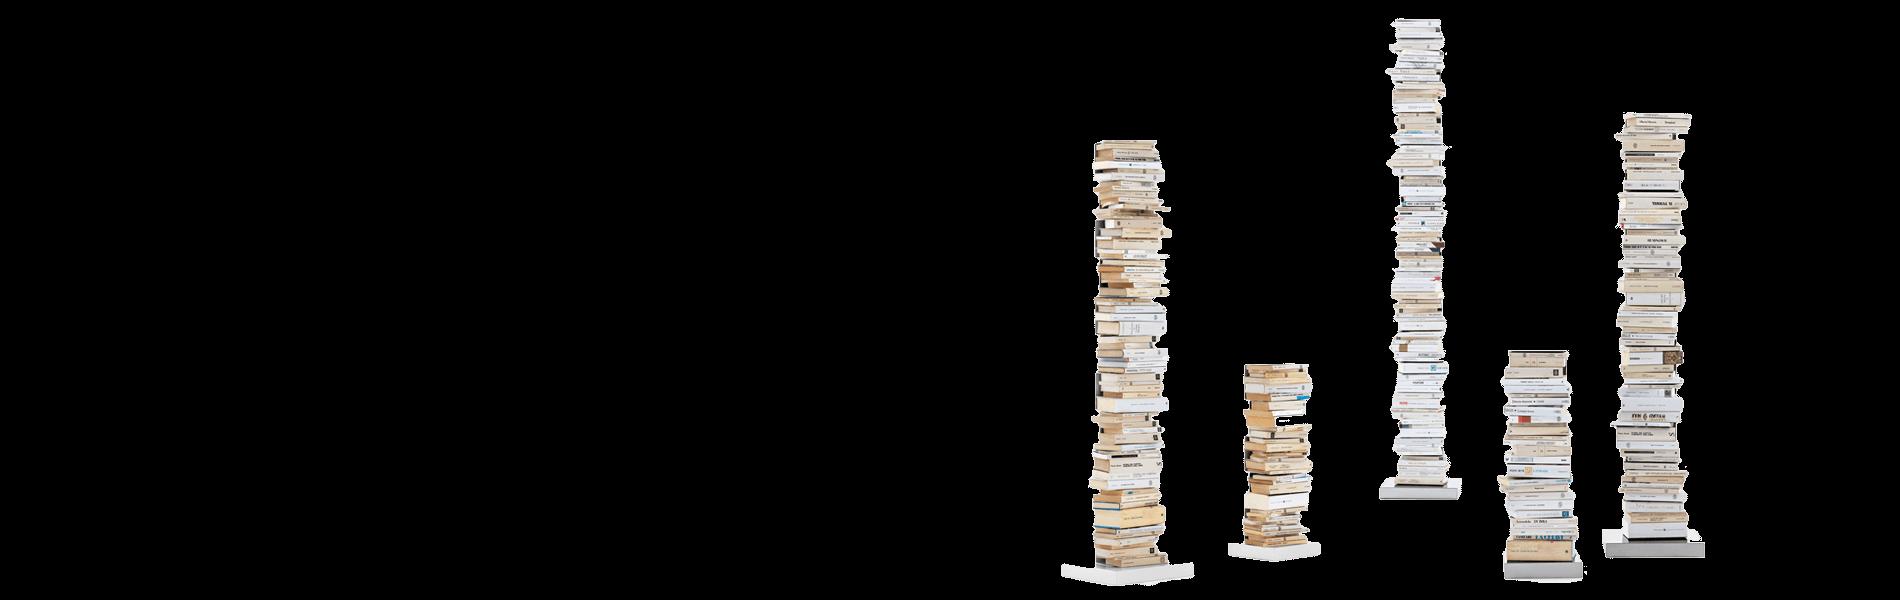 Floor Standing Bookshelves